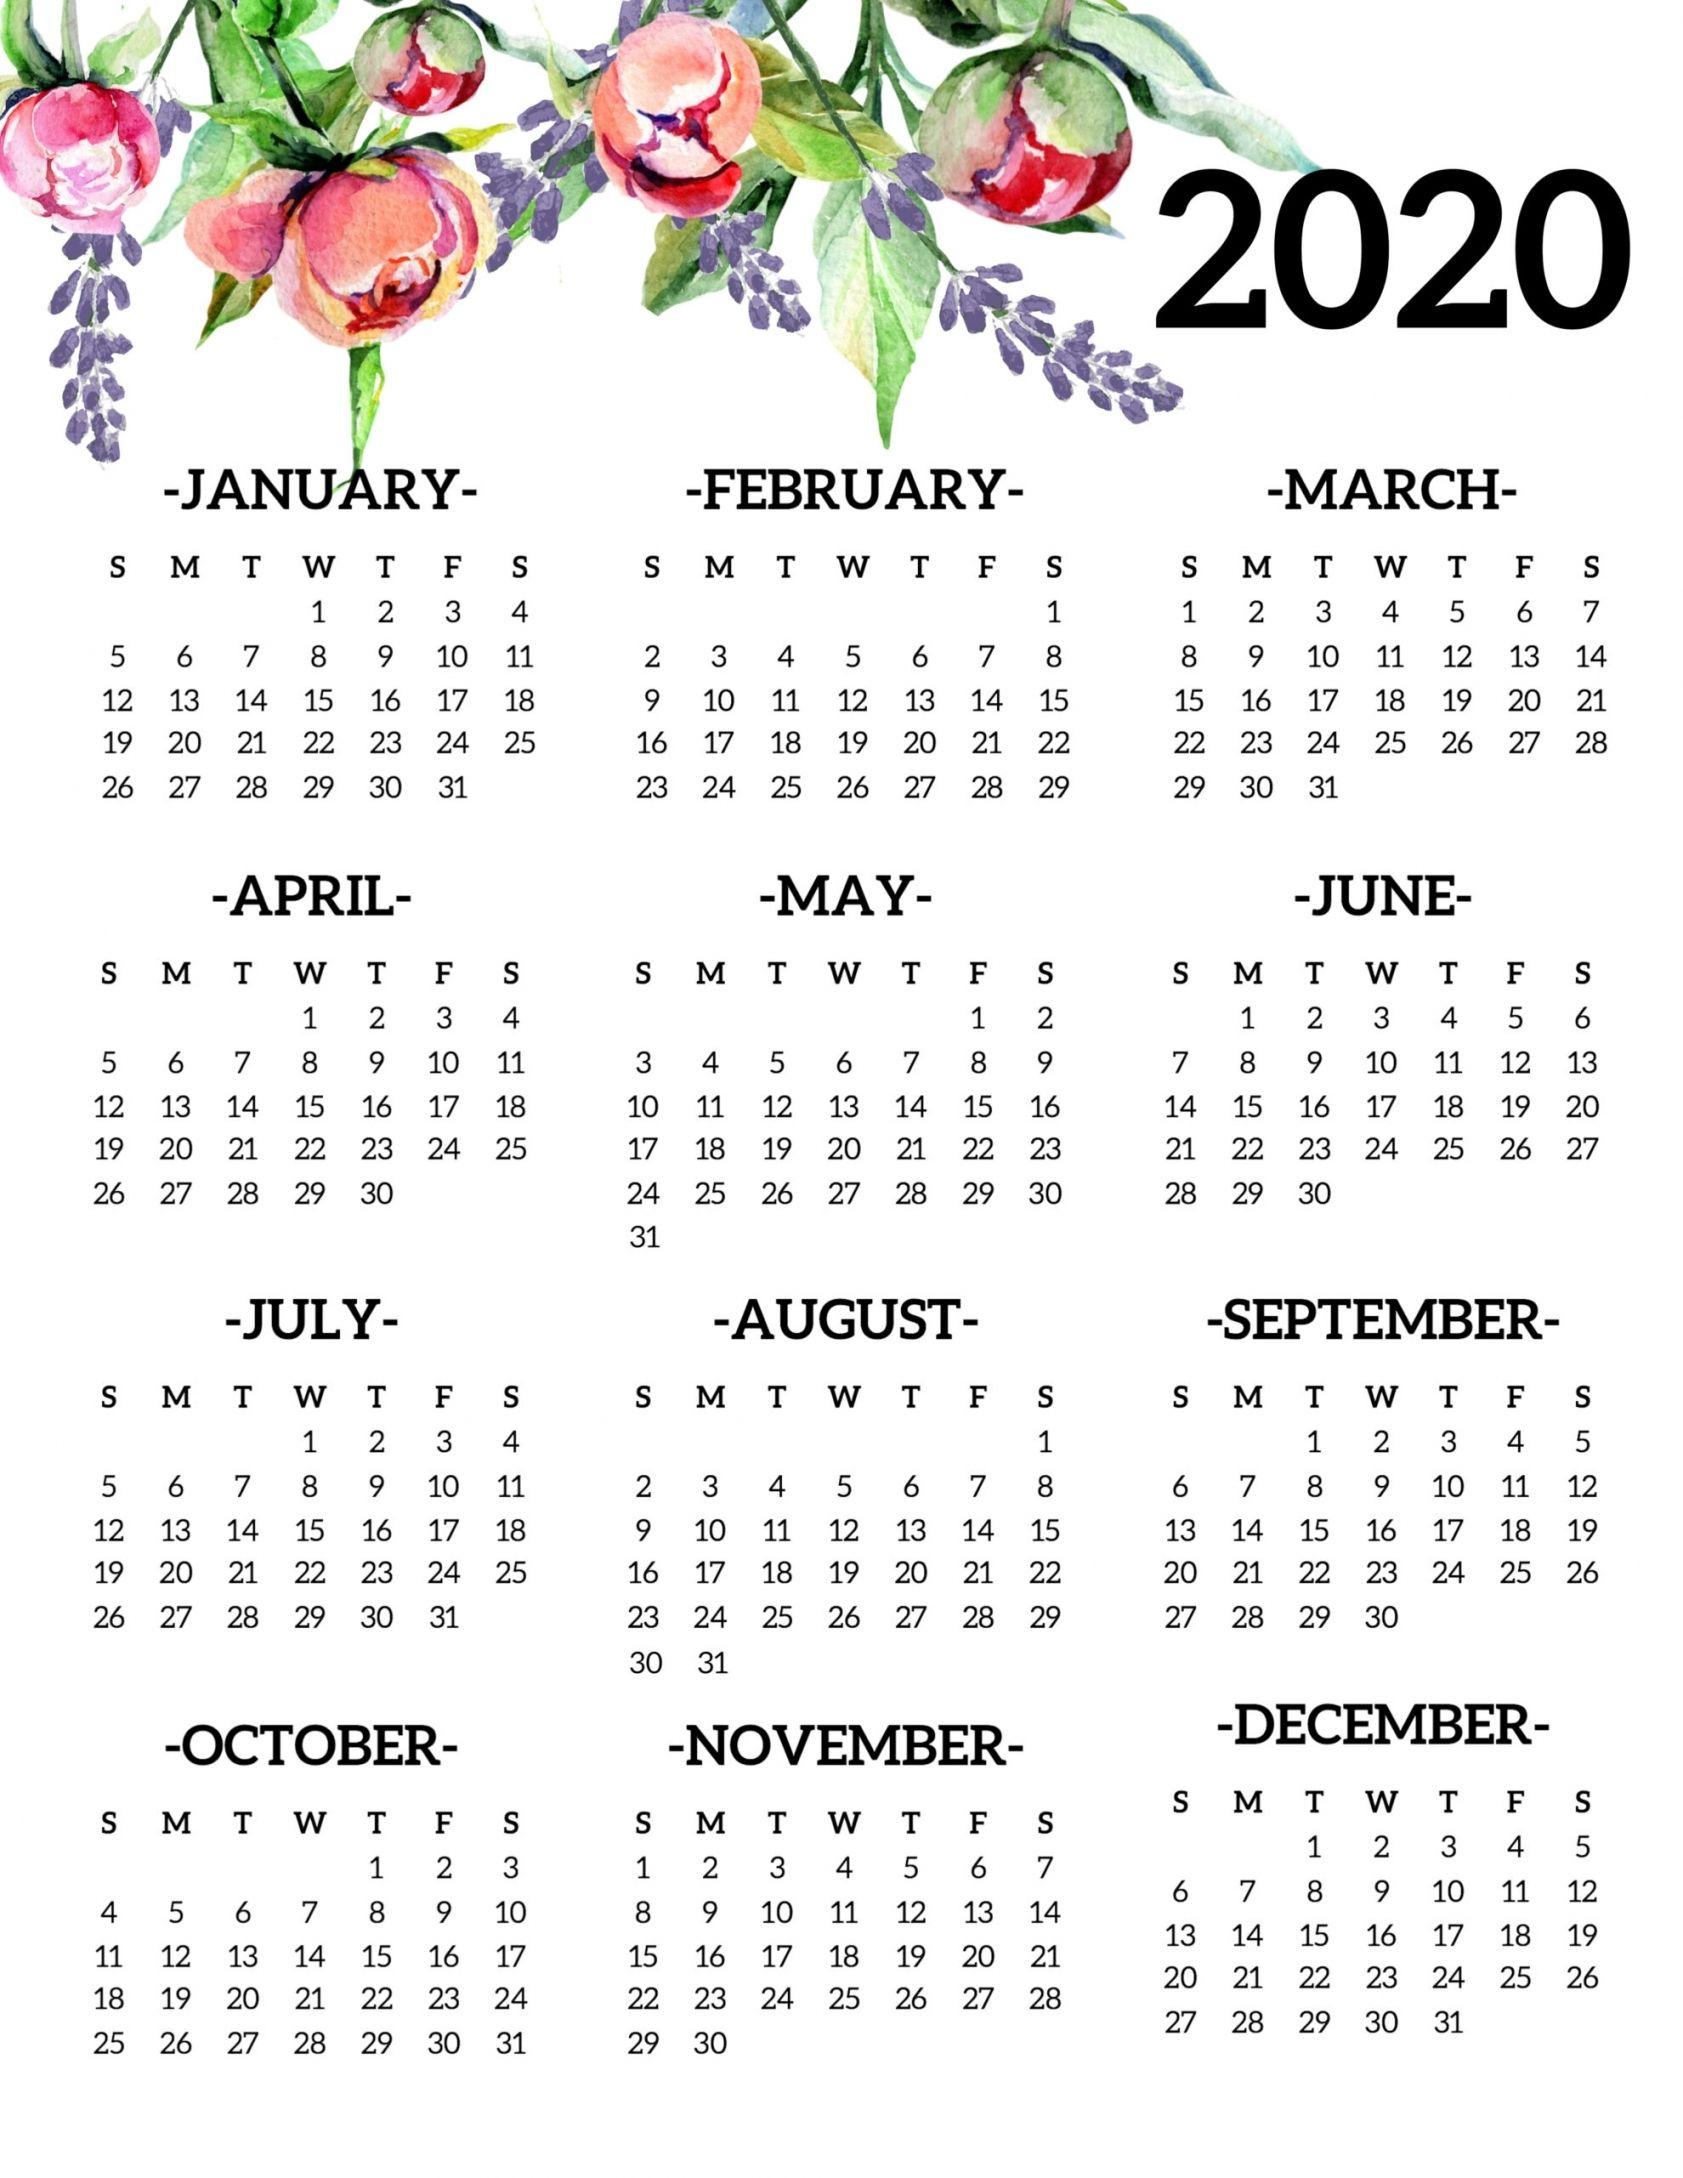 2020 Calendar Printable One Page Di 2020 Kalender Buku Mewarnai